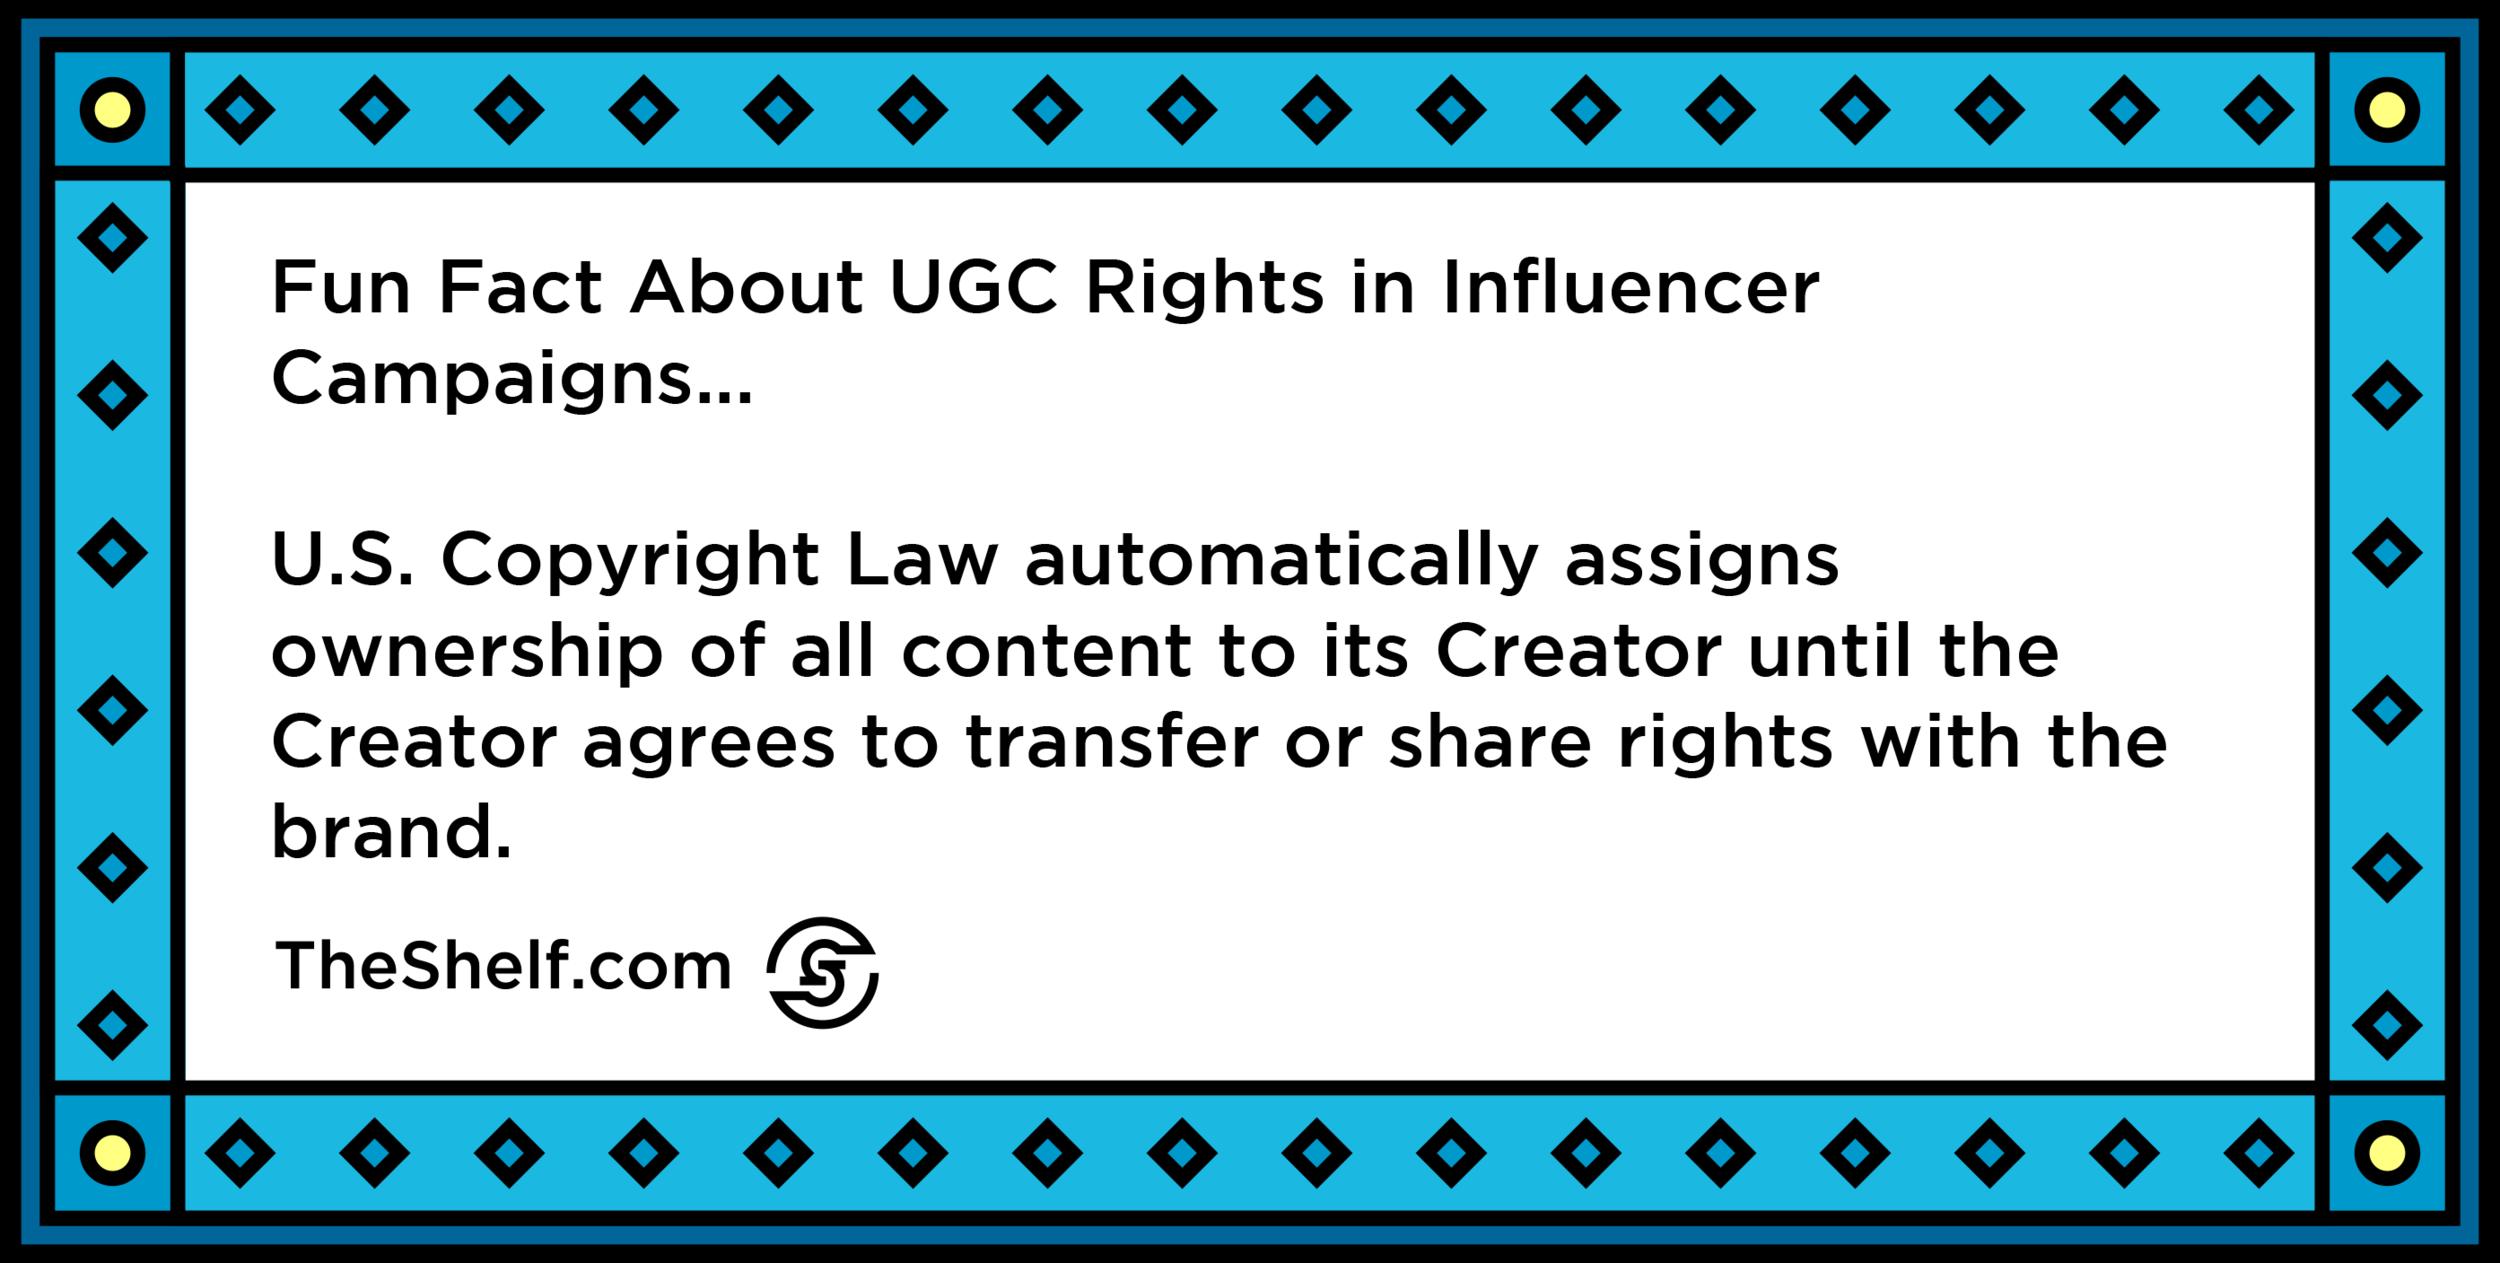 UGC Rights - UpWork_3.png